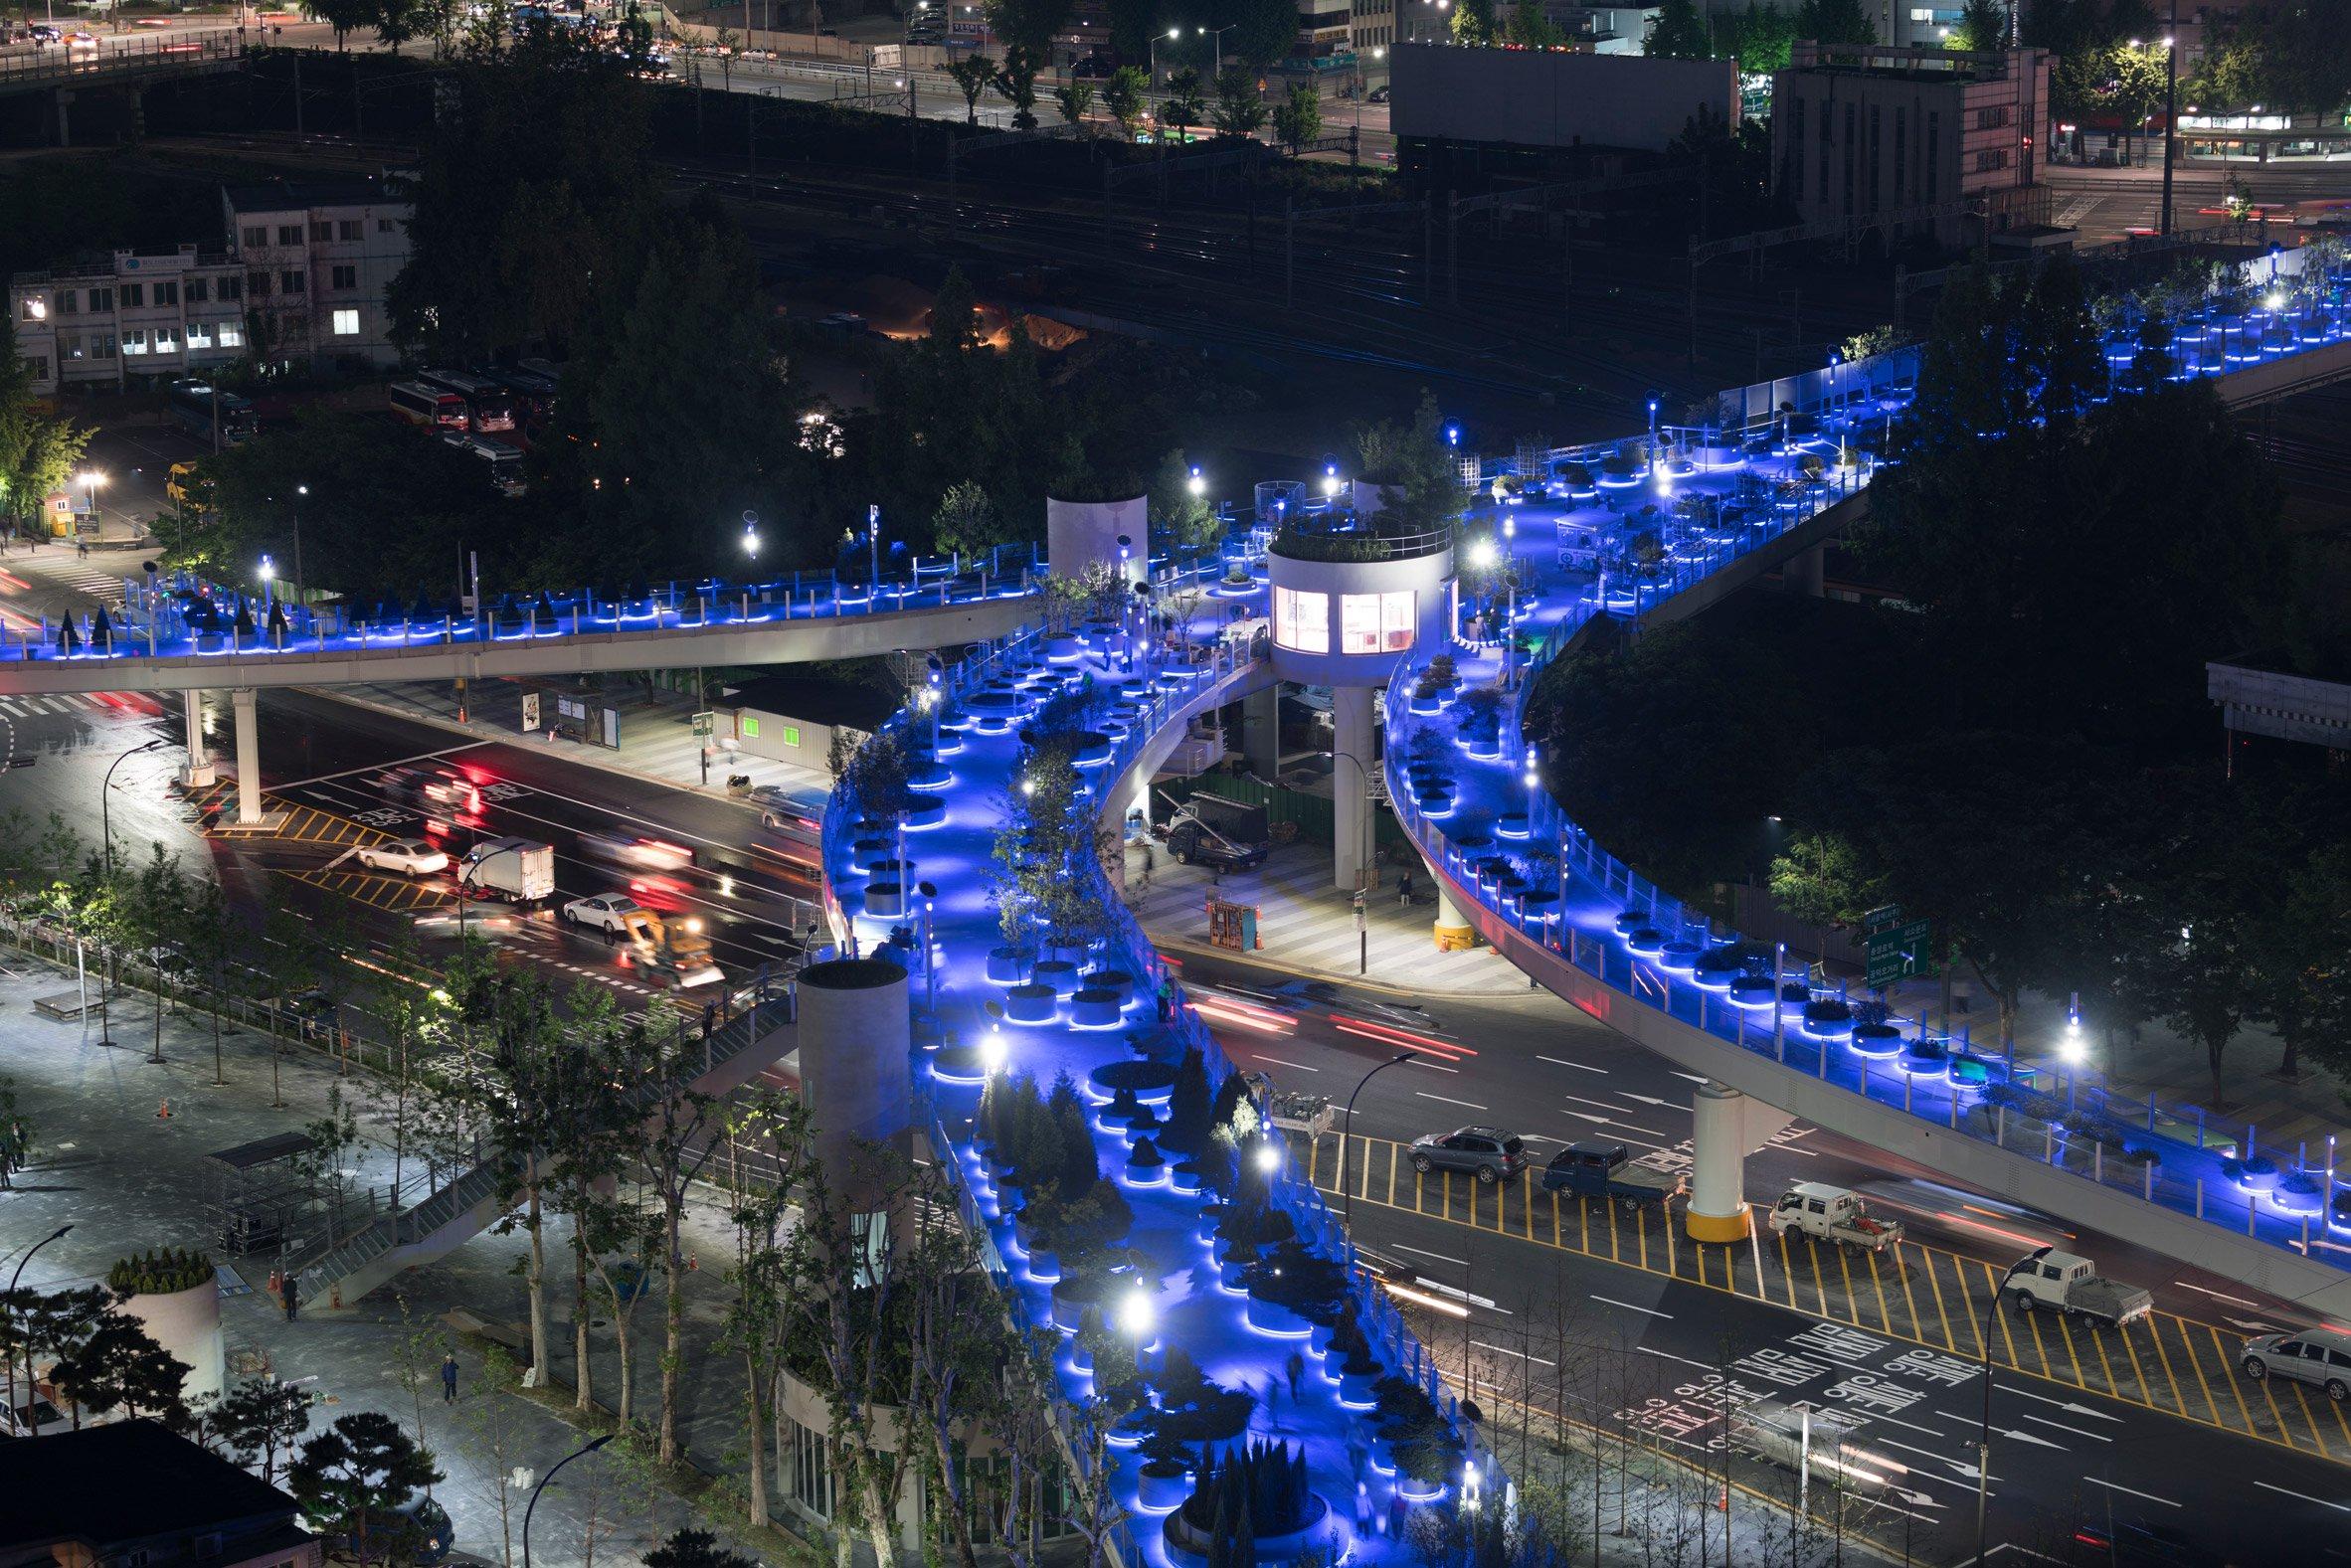 skygarden-mvrdv-architecture-landscape-urbanism-seoul-south-korea-_dezeen_2364_col_1.jpg